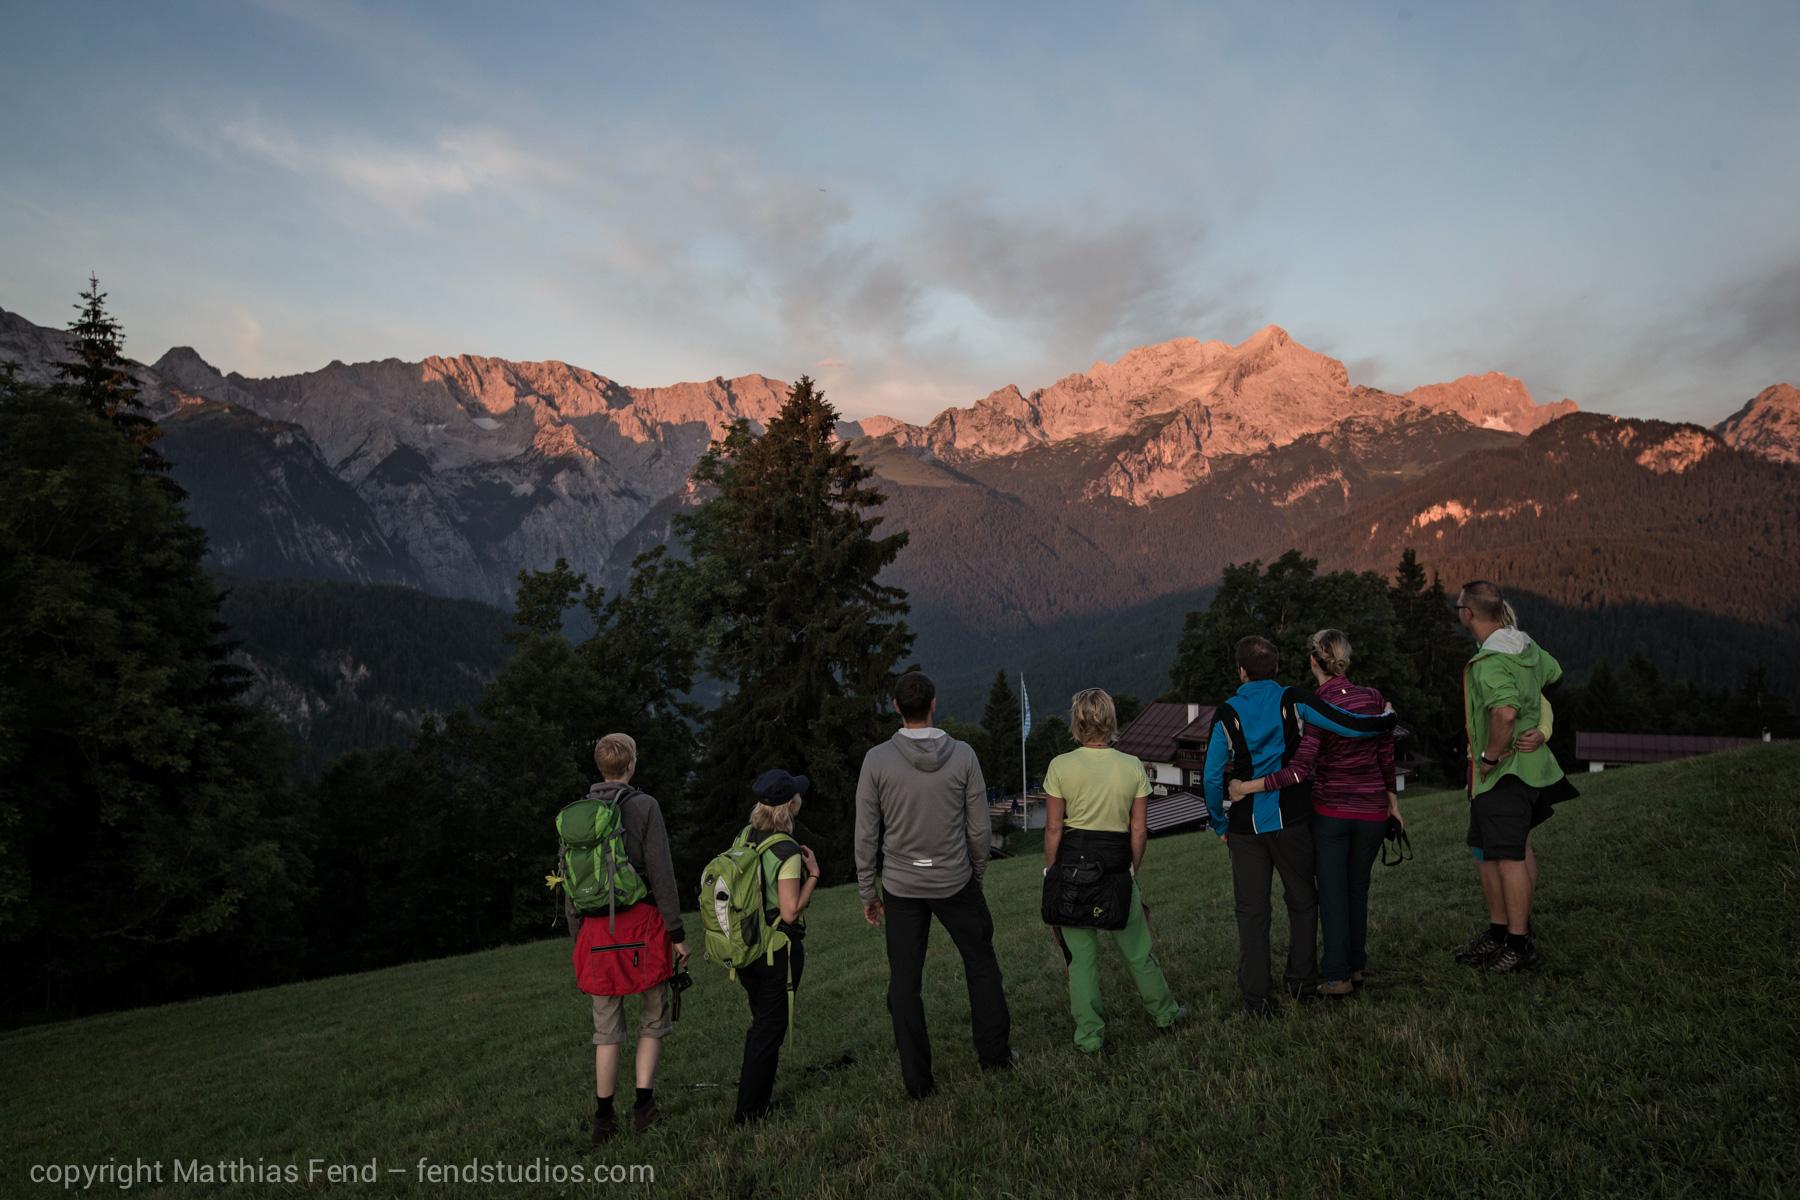 MF_20140802_AlpenTestival_0059_IG